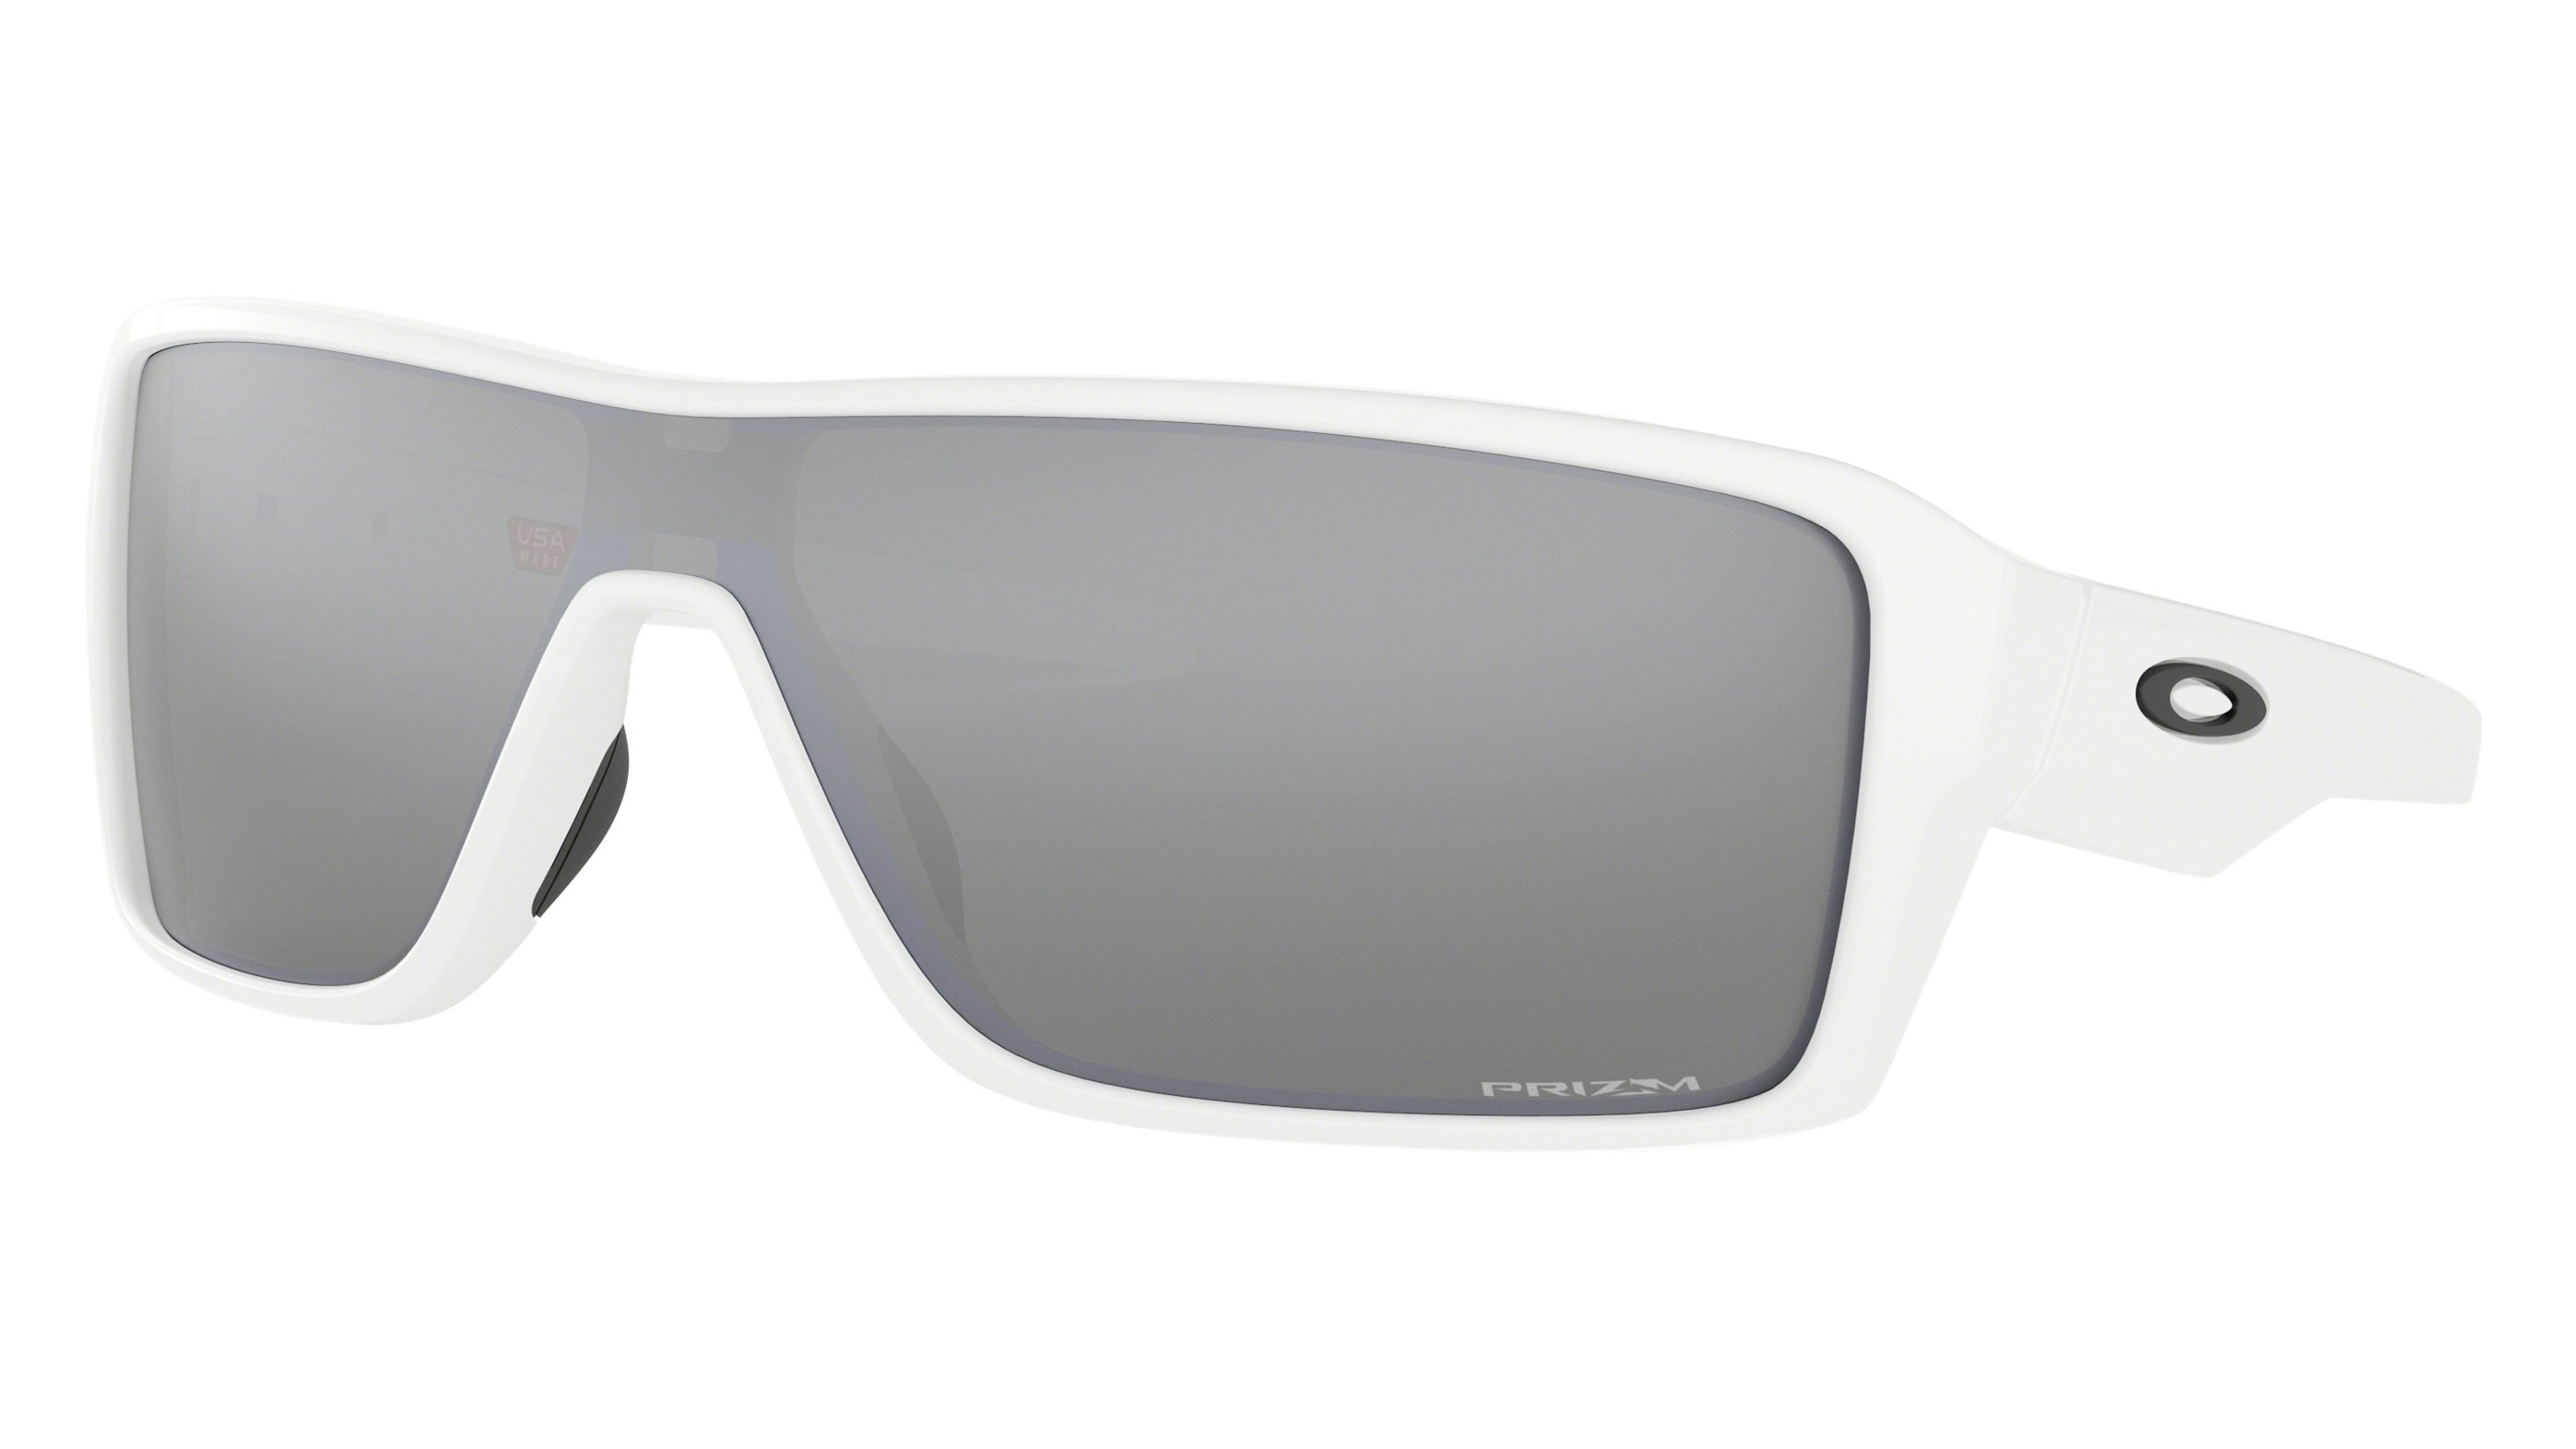 e66949bfdb Oakley Ridgeline Sunglasses